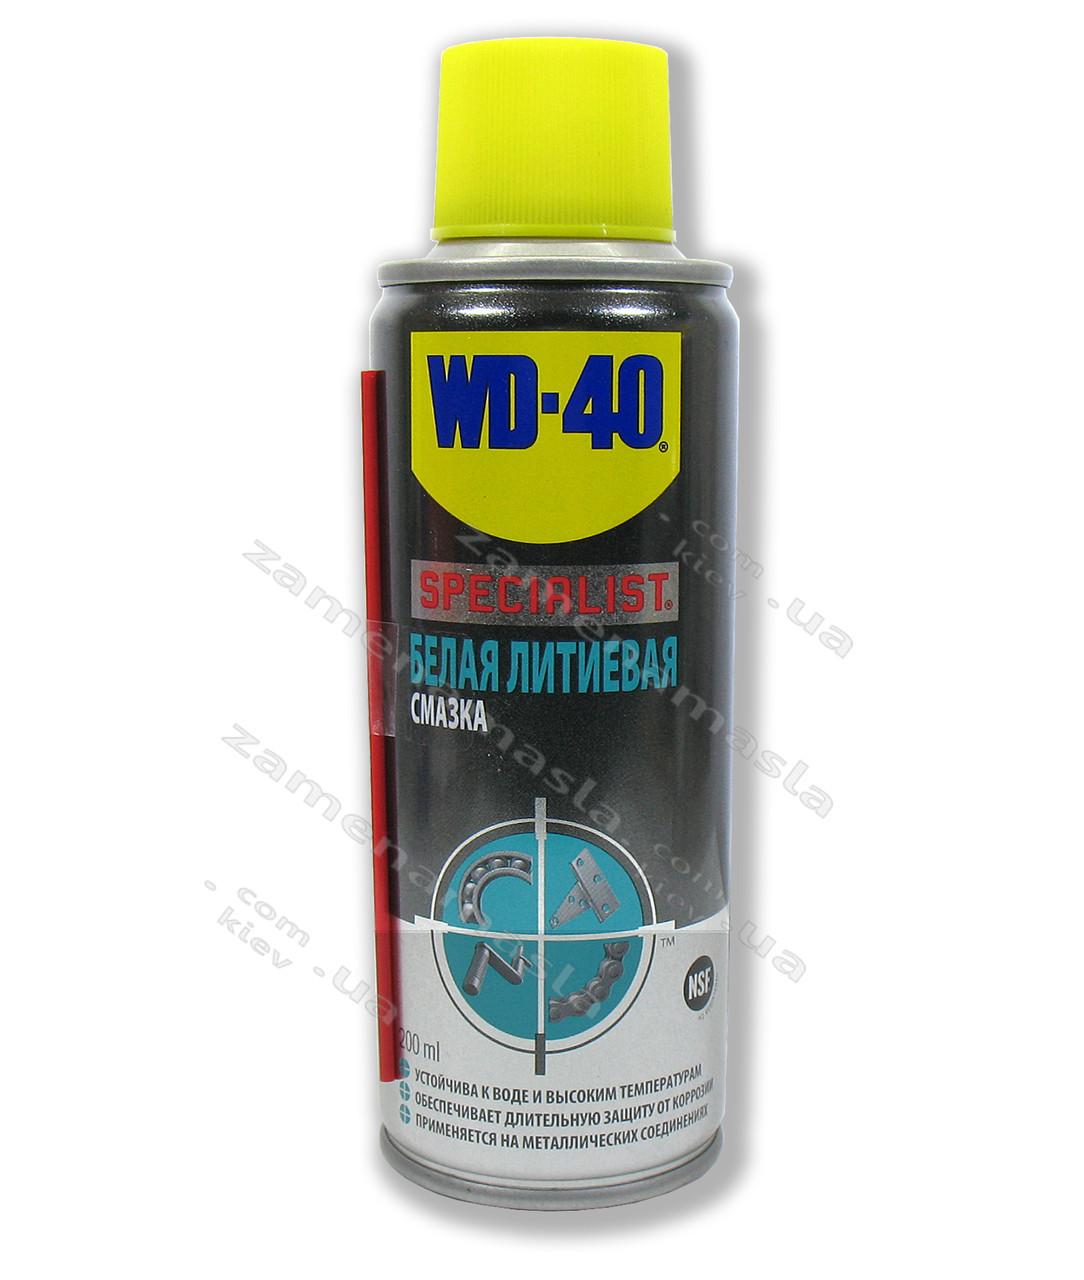 WD-40 specialist - белая литиевая